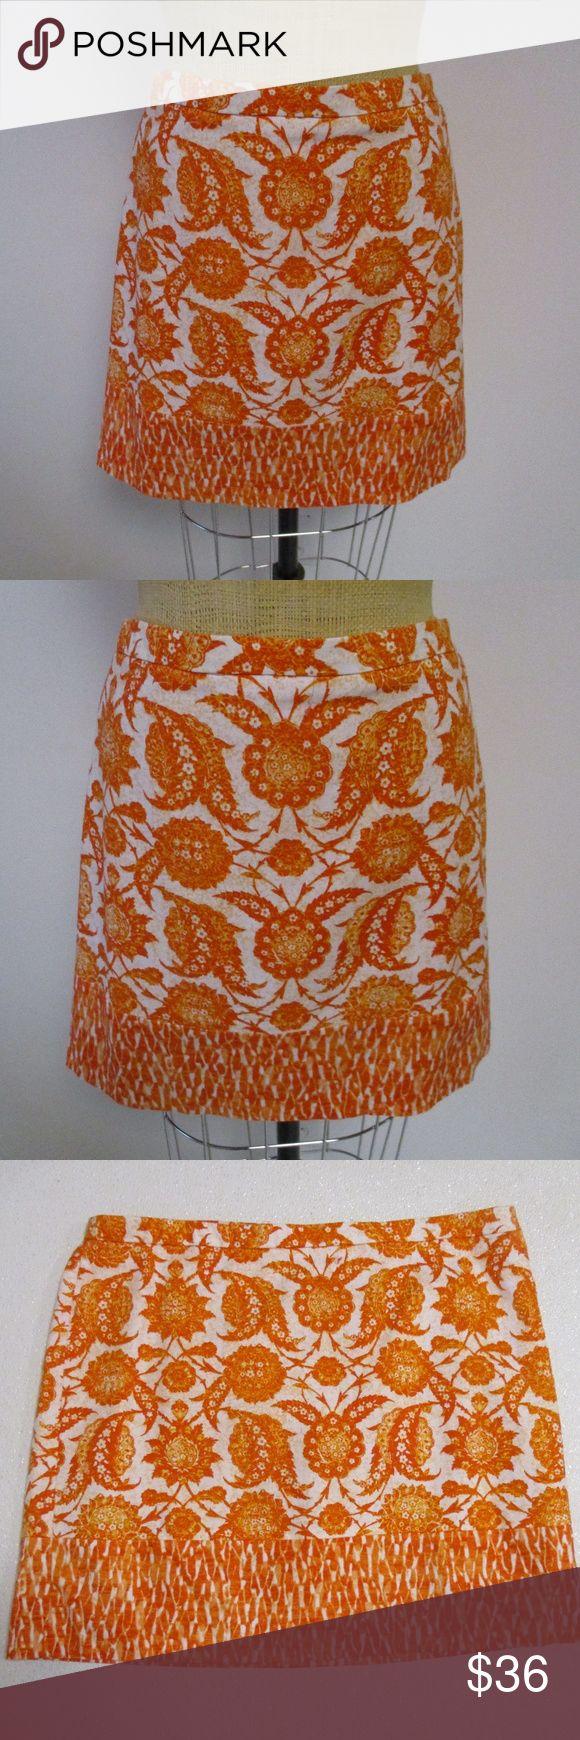 "Michael Kors Orange White Floral Skirt 14 Cute skirt from Michael Kors in size 14     Orange and white print     Straight style     Above knee length     98% cotton/2% elastane     Excellent condition     Machine washable cold     Waist- 35""  Hips- 45""  Length- 17.5"" Michael Kors Skirts Mini"